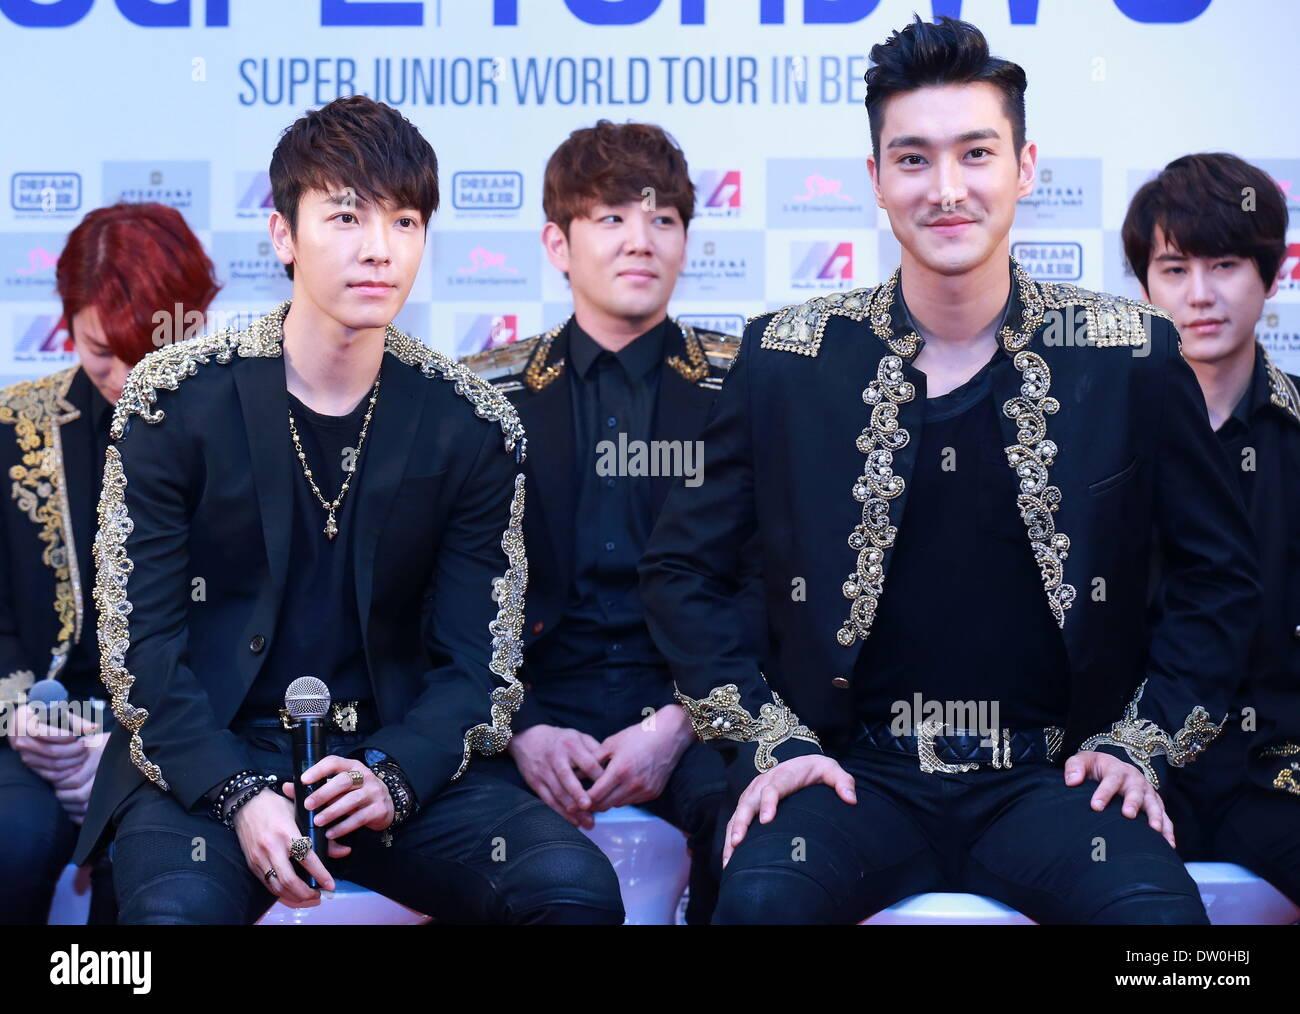 Beijing, China  22nd Feb, 2014  South Korean boy band Super Junior